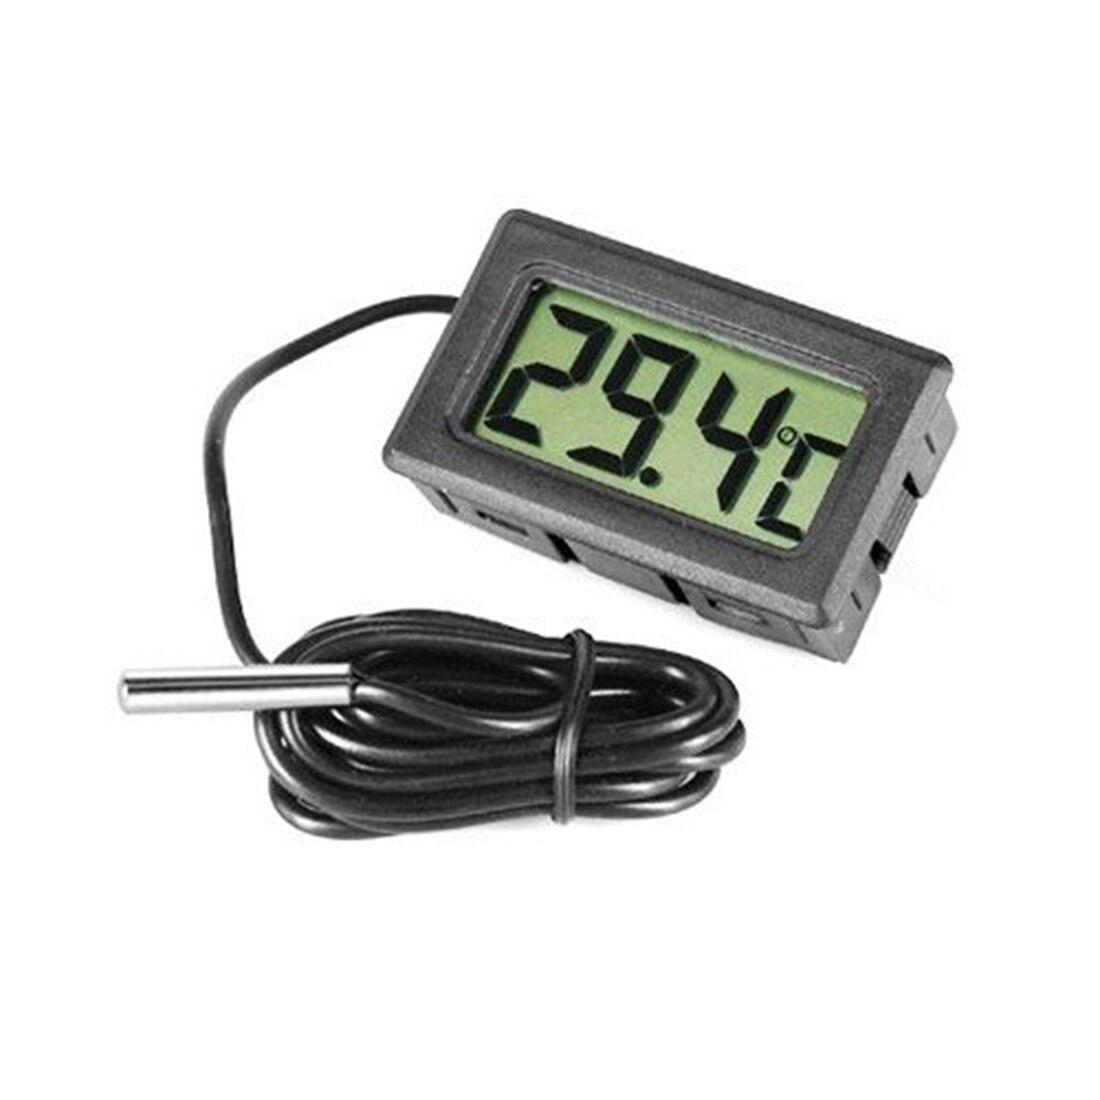 1pcs Mini LCD Digital Thermometer for Fridges Freezers Coolers Aquarium Chillers Mini 1M Probe Black